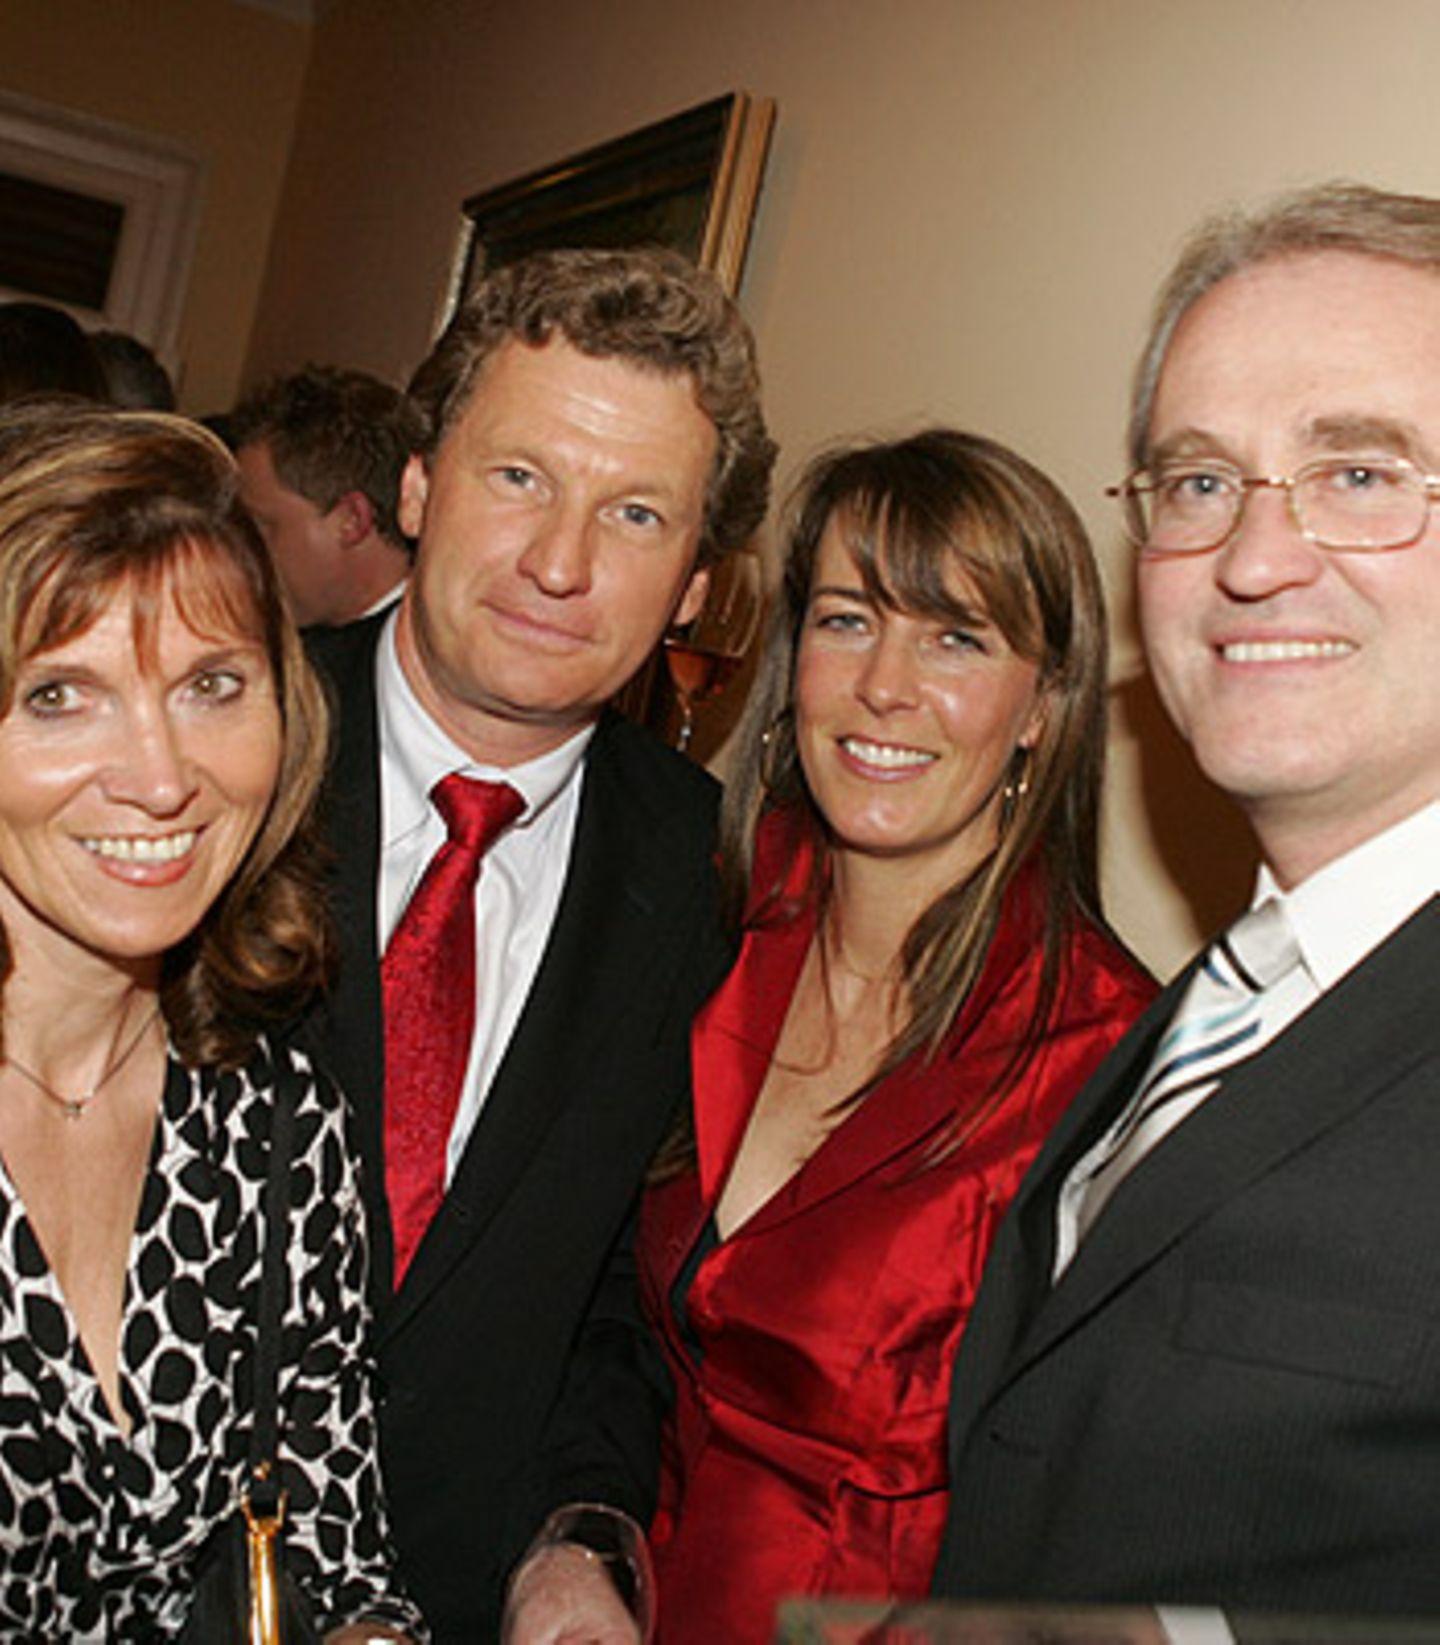 Bernd Buchholz und Ehefrau Inga Jensen-Buchholz und Bernd Kundrun mit Ehefrau Viola